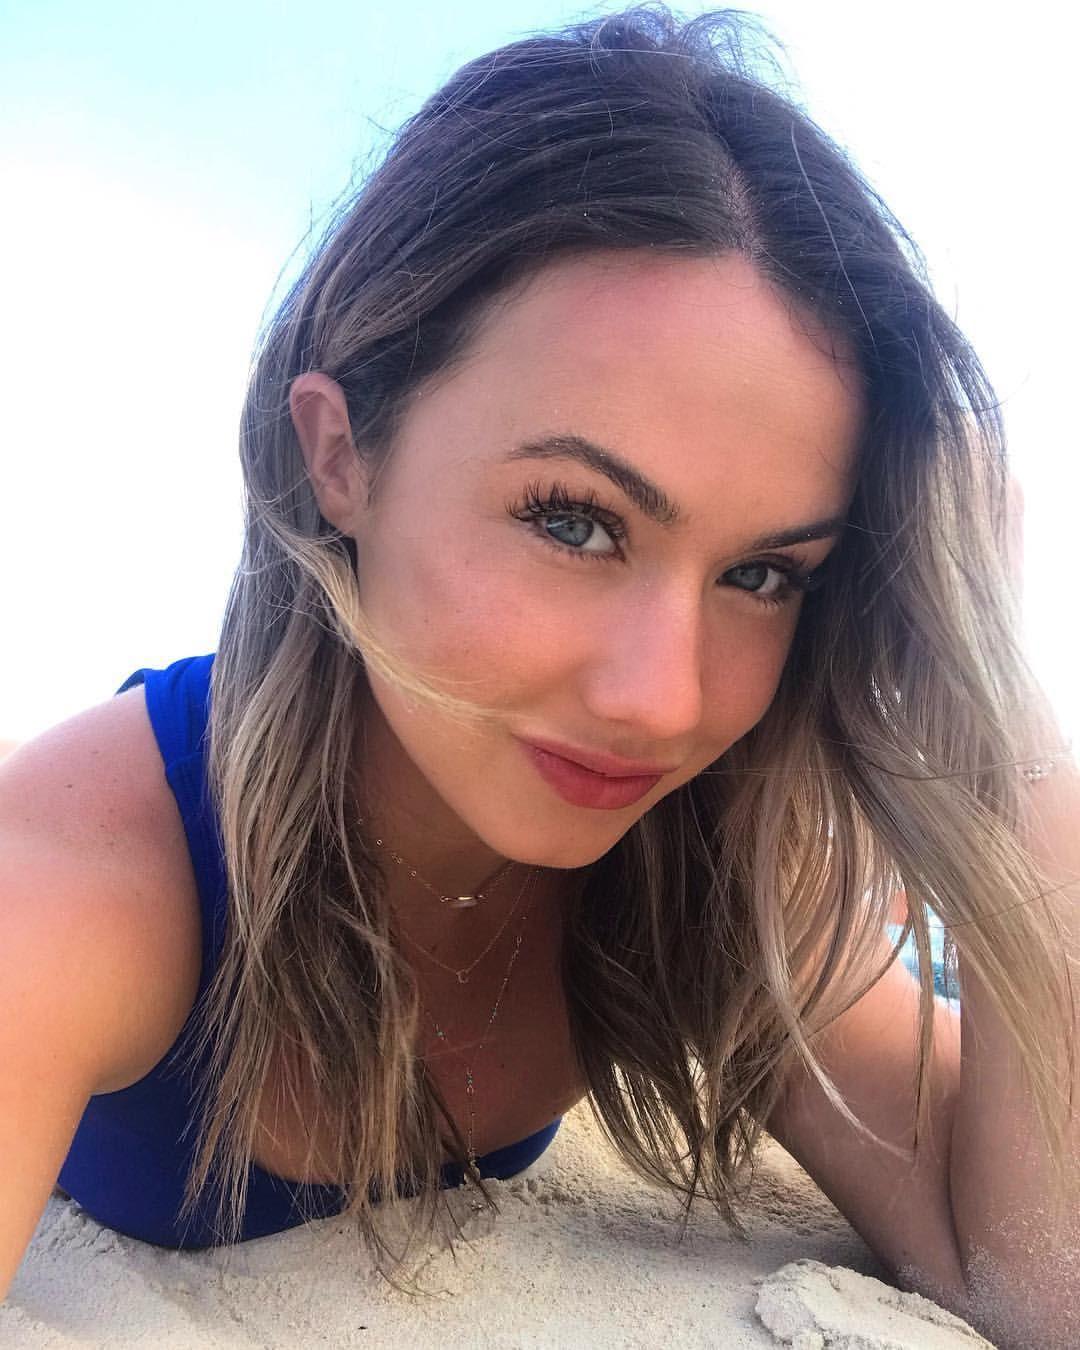 Celeste Bouchard Nude Leaked The Fappening 0028